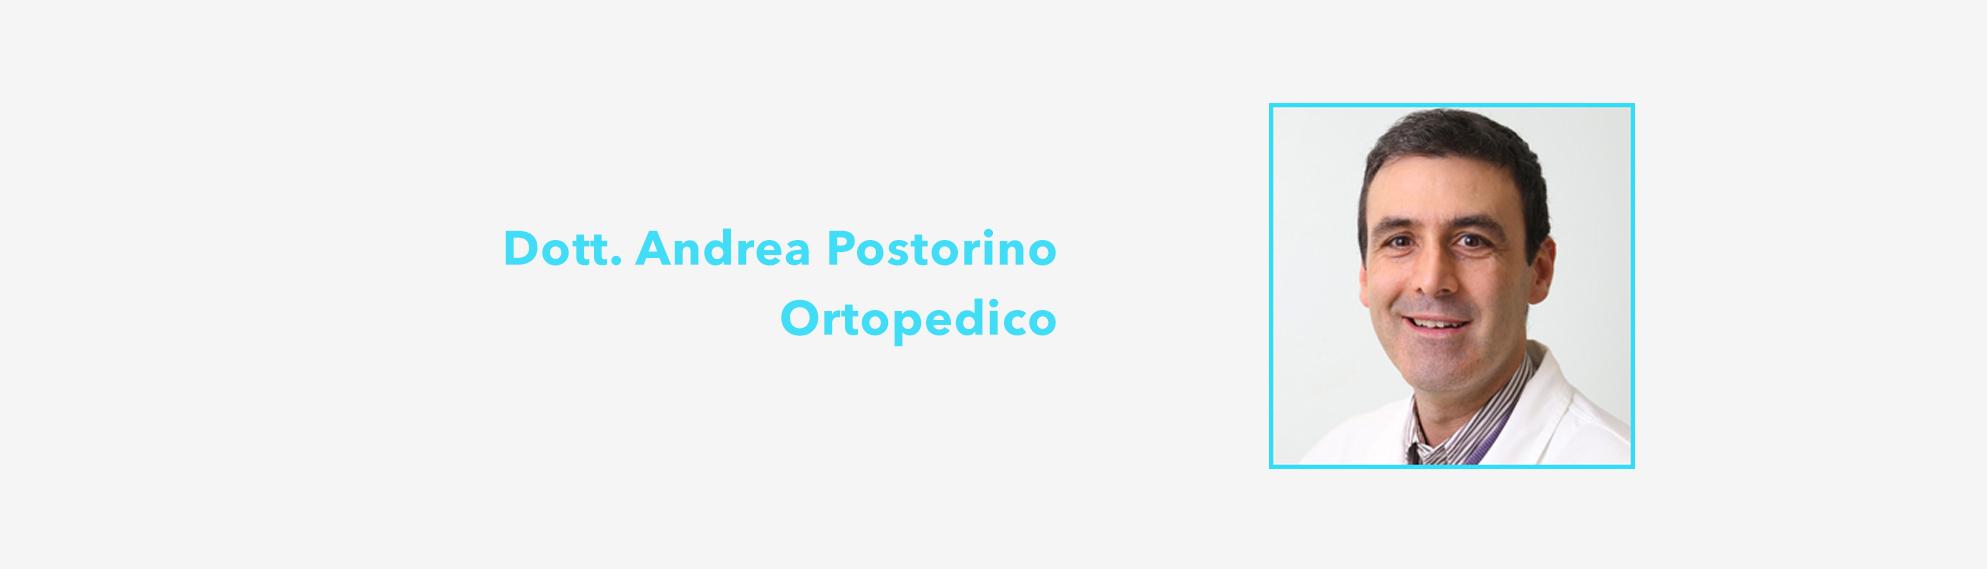 dott. Andrea Postorino